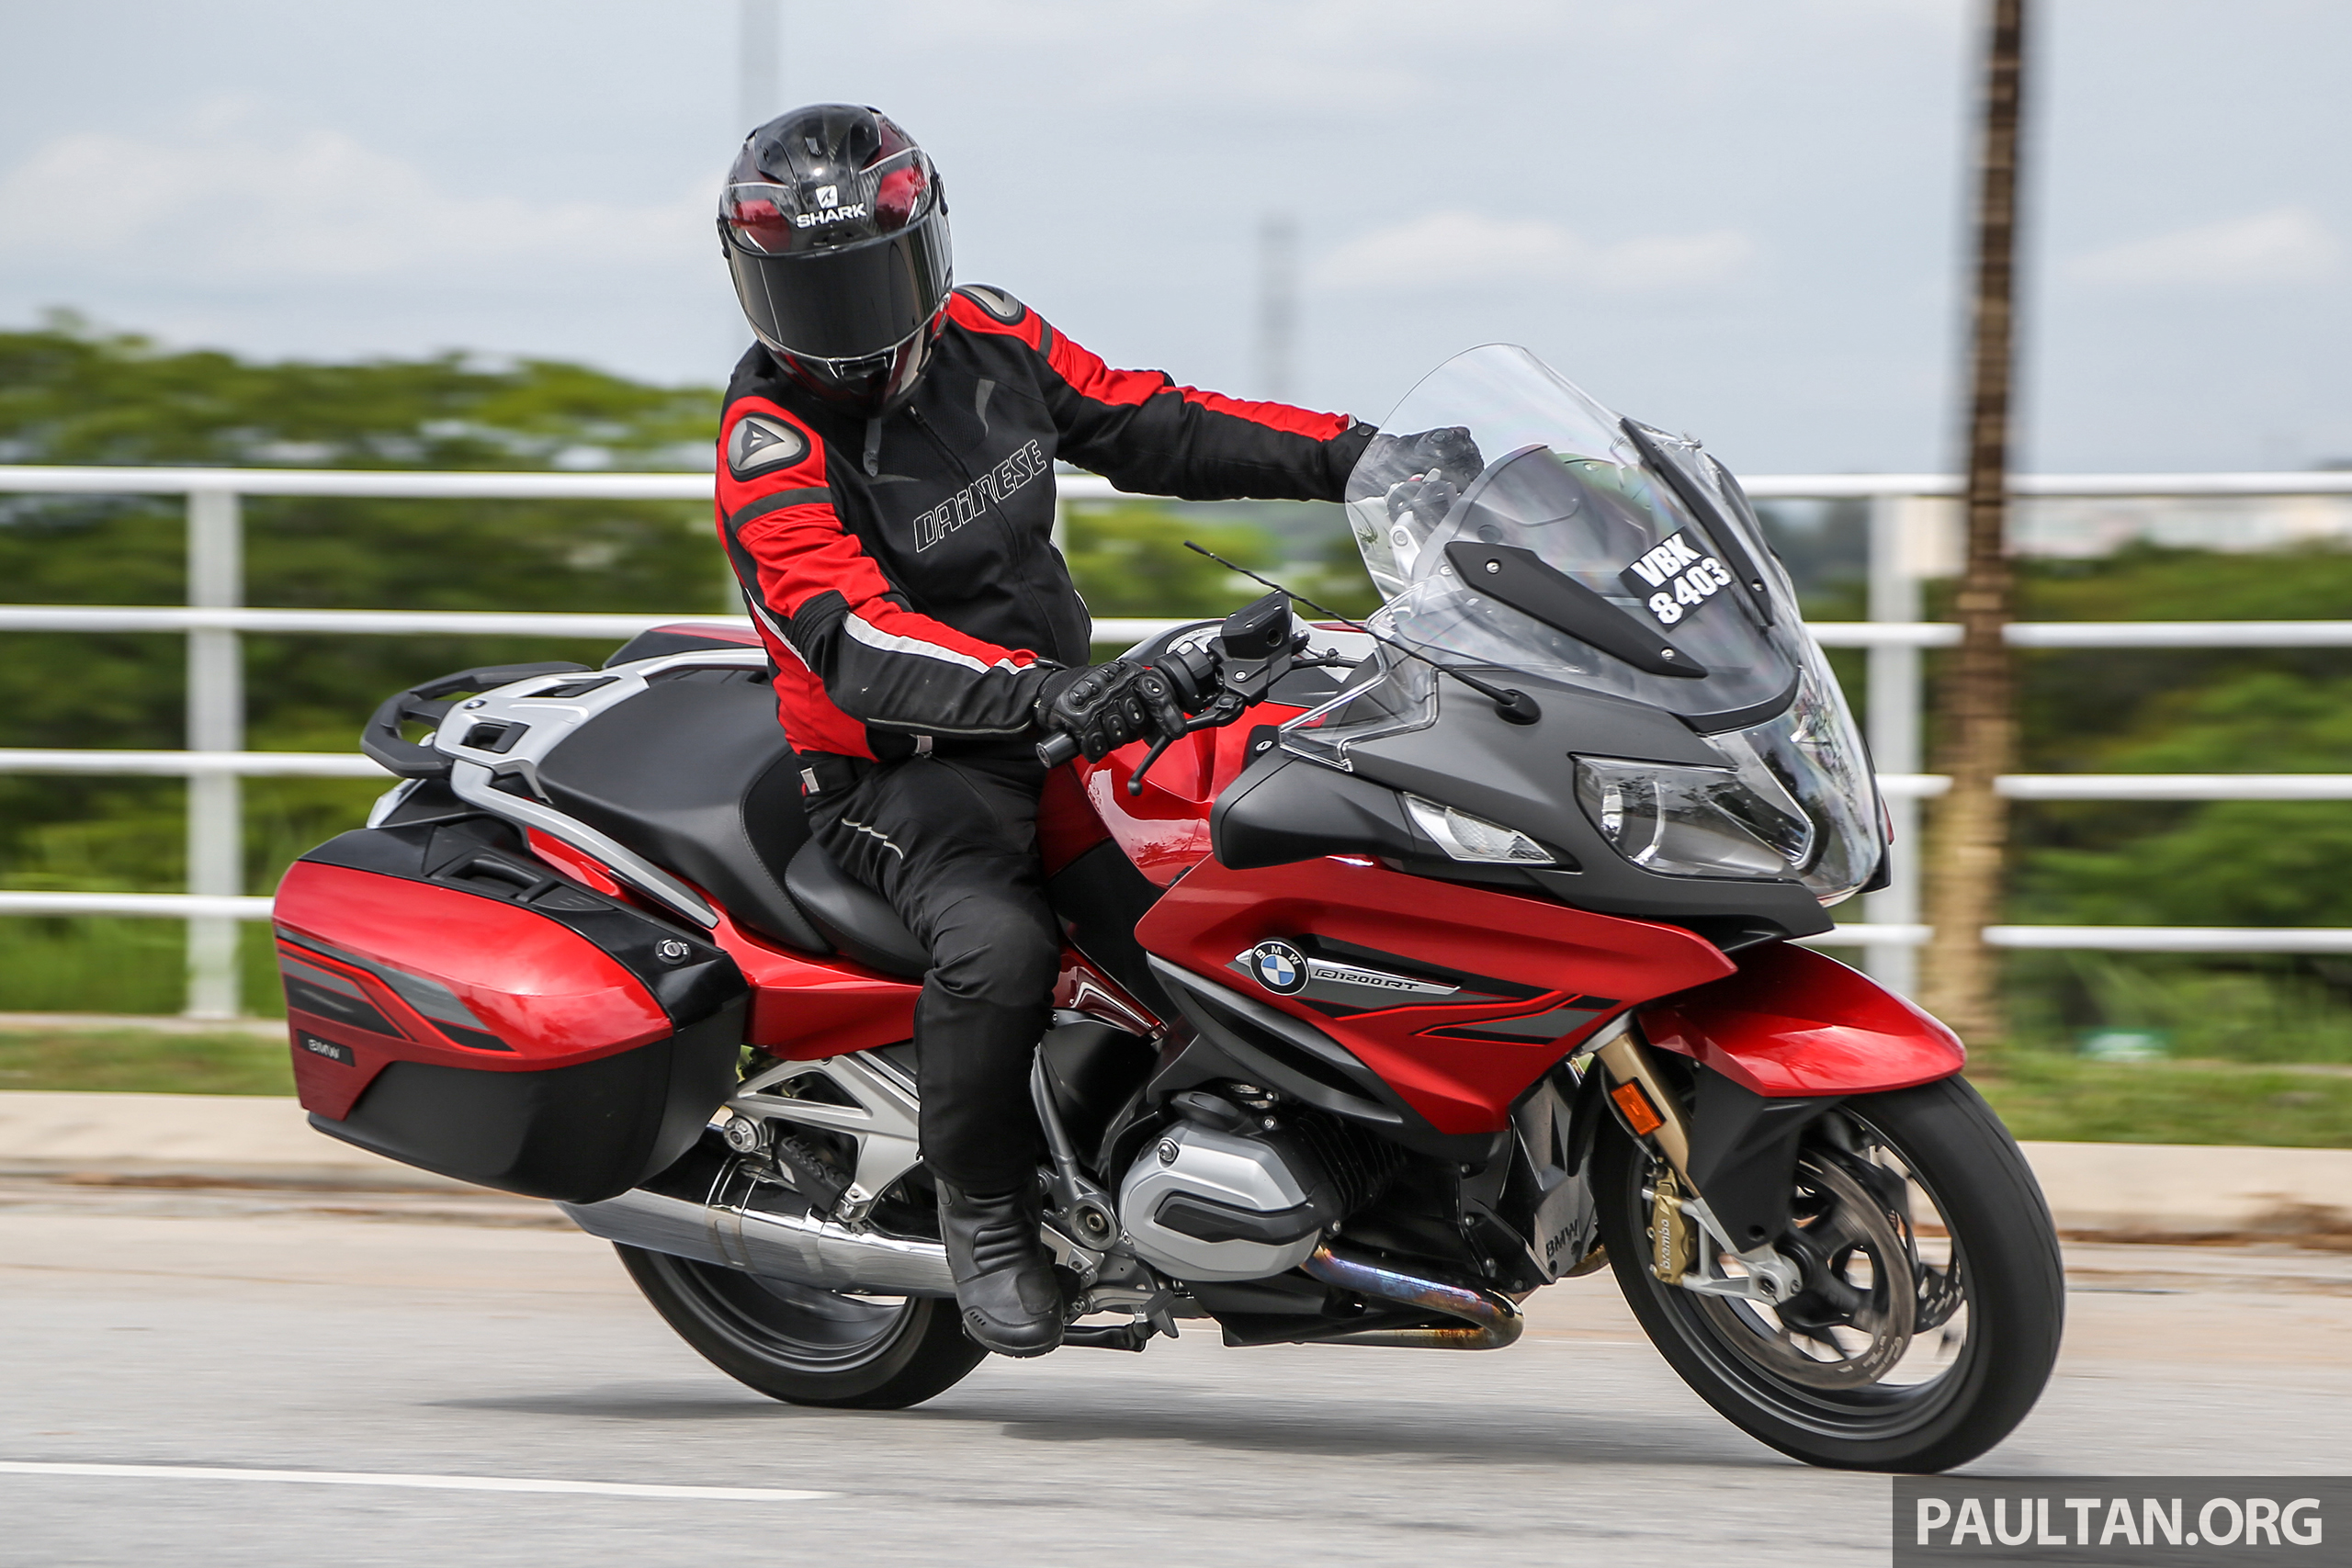 REVIEW: 2018 BMW Motorrad R 1200 RT - RM127,900